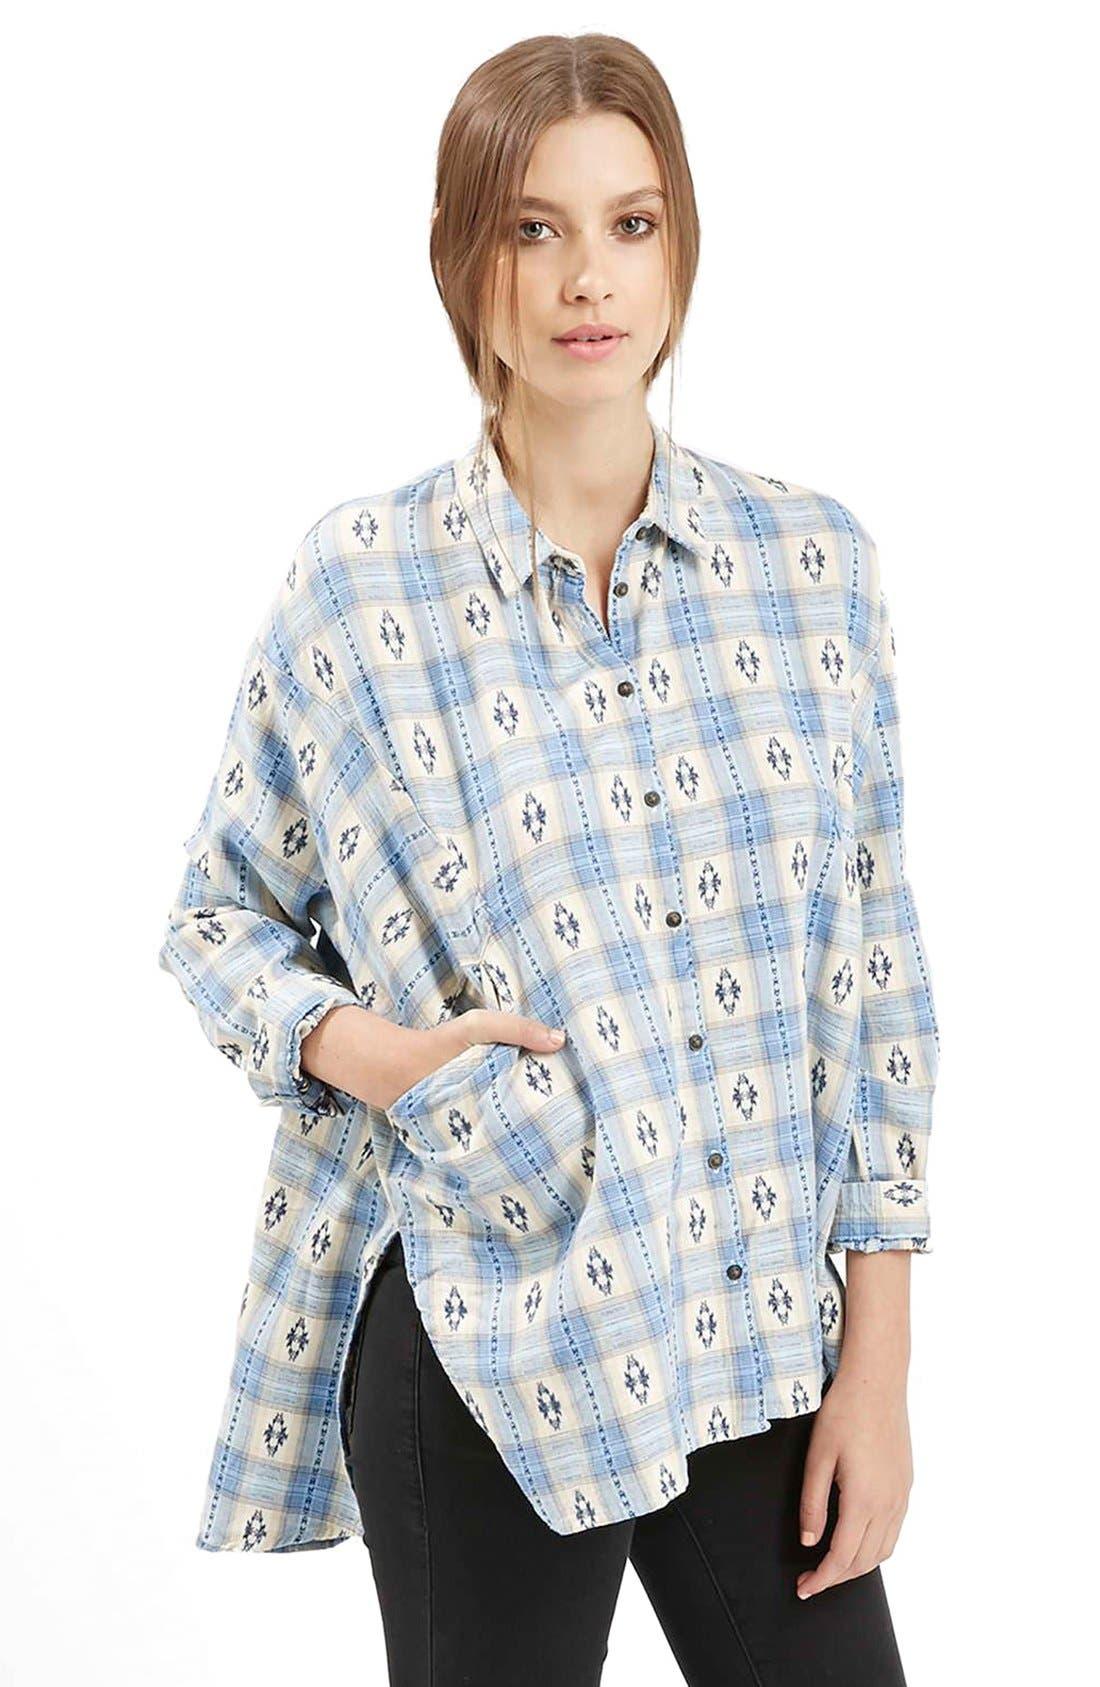 Alternate Image 1 Selected - Topshop Southwestern Print Oversize Button Down Shirt